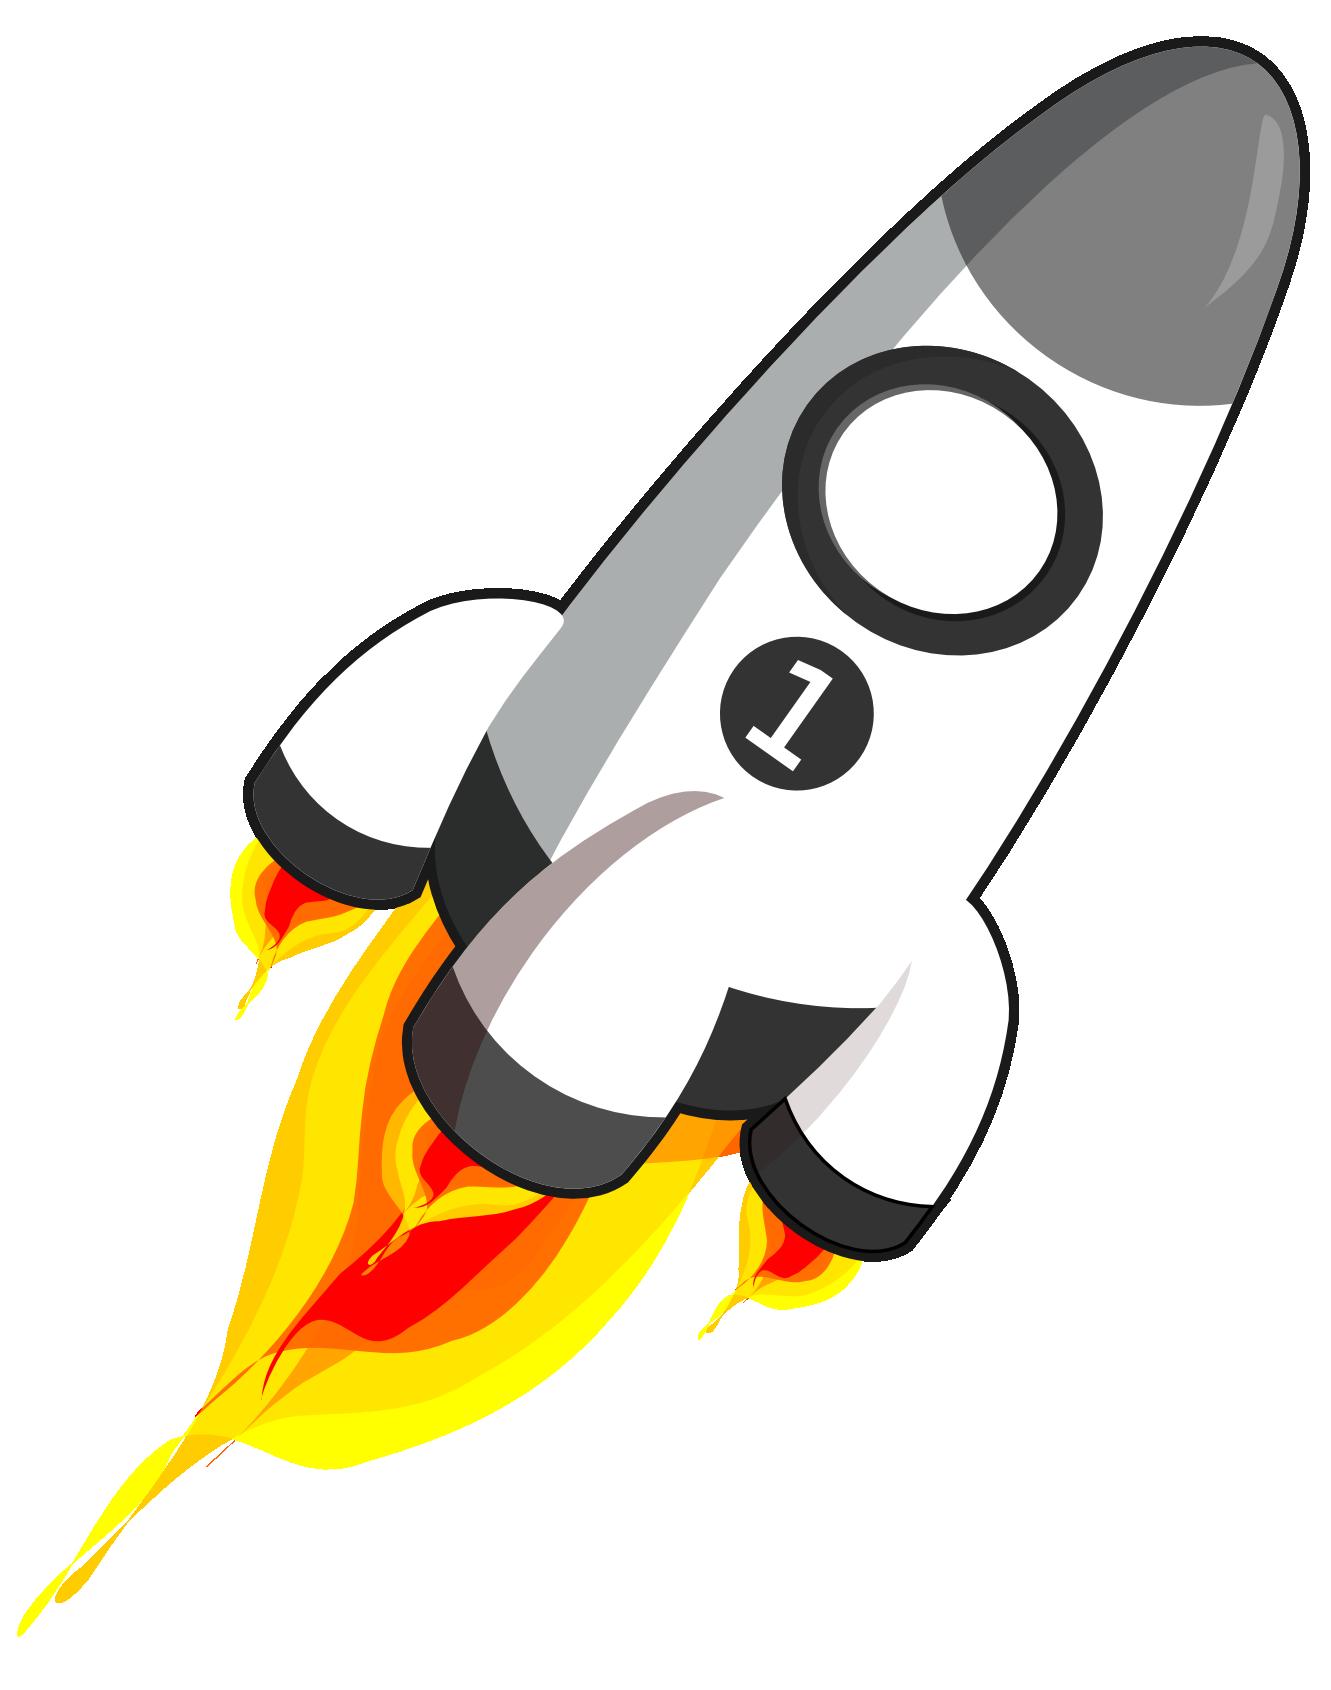 Spaceship clipart retro.  collection of rocket